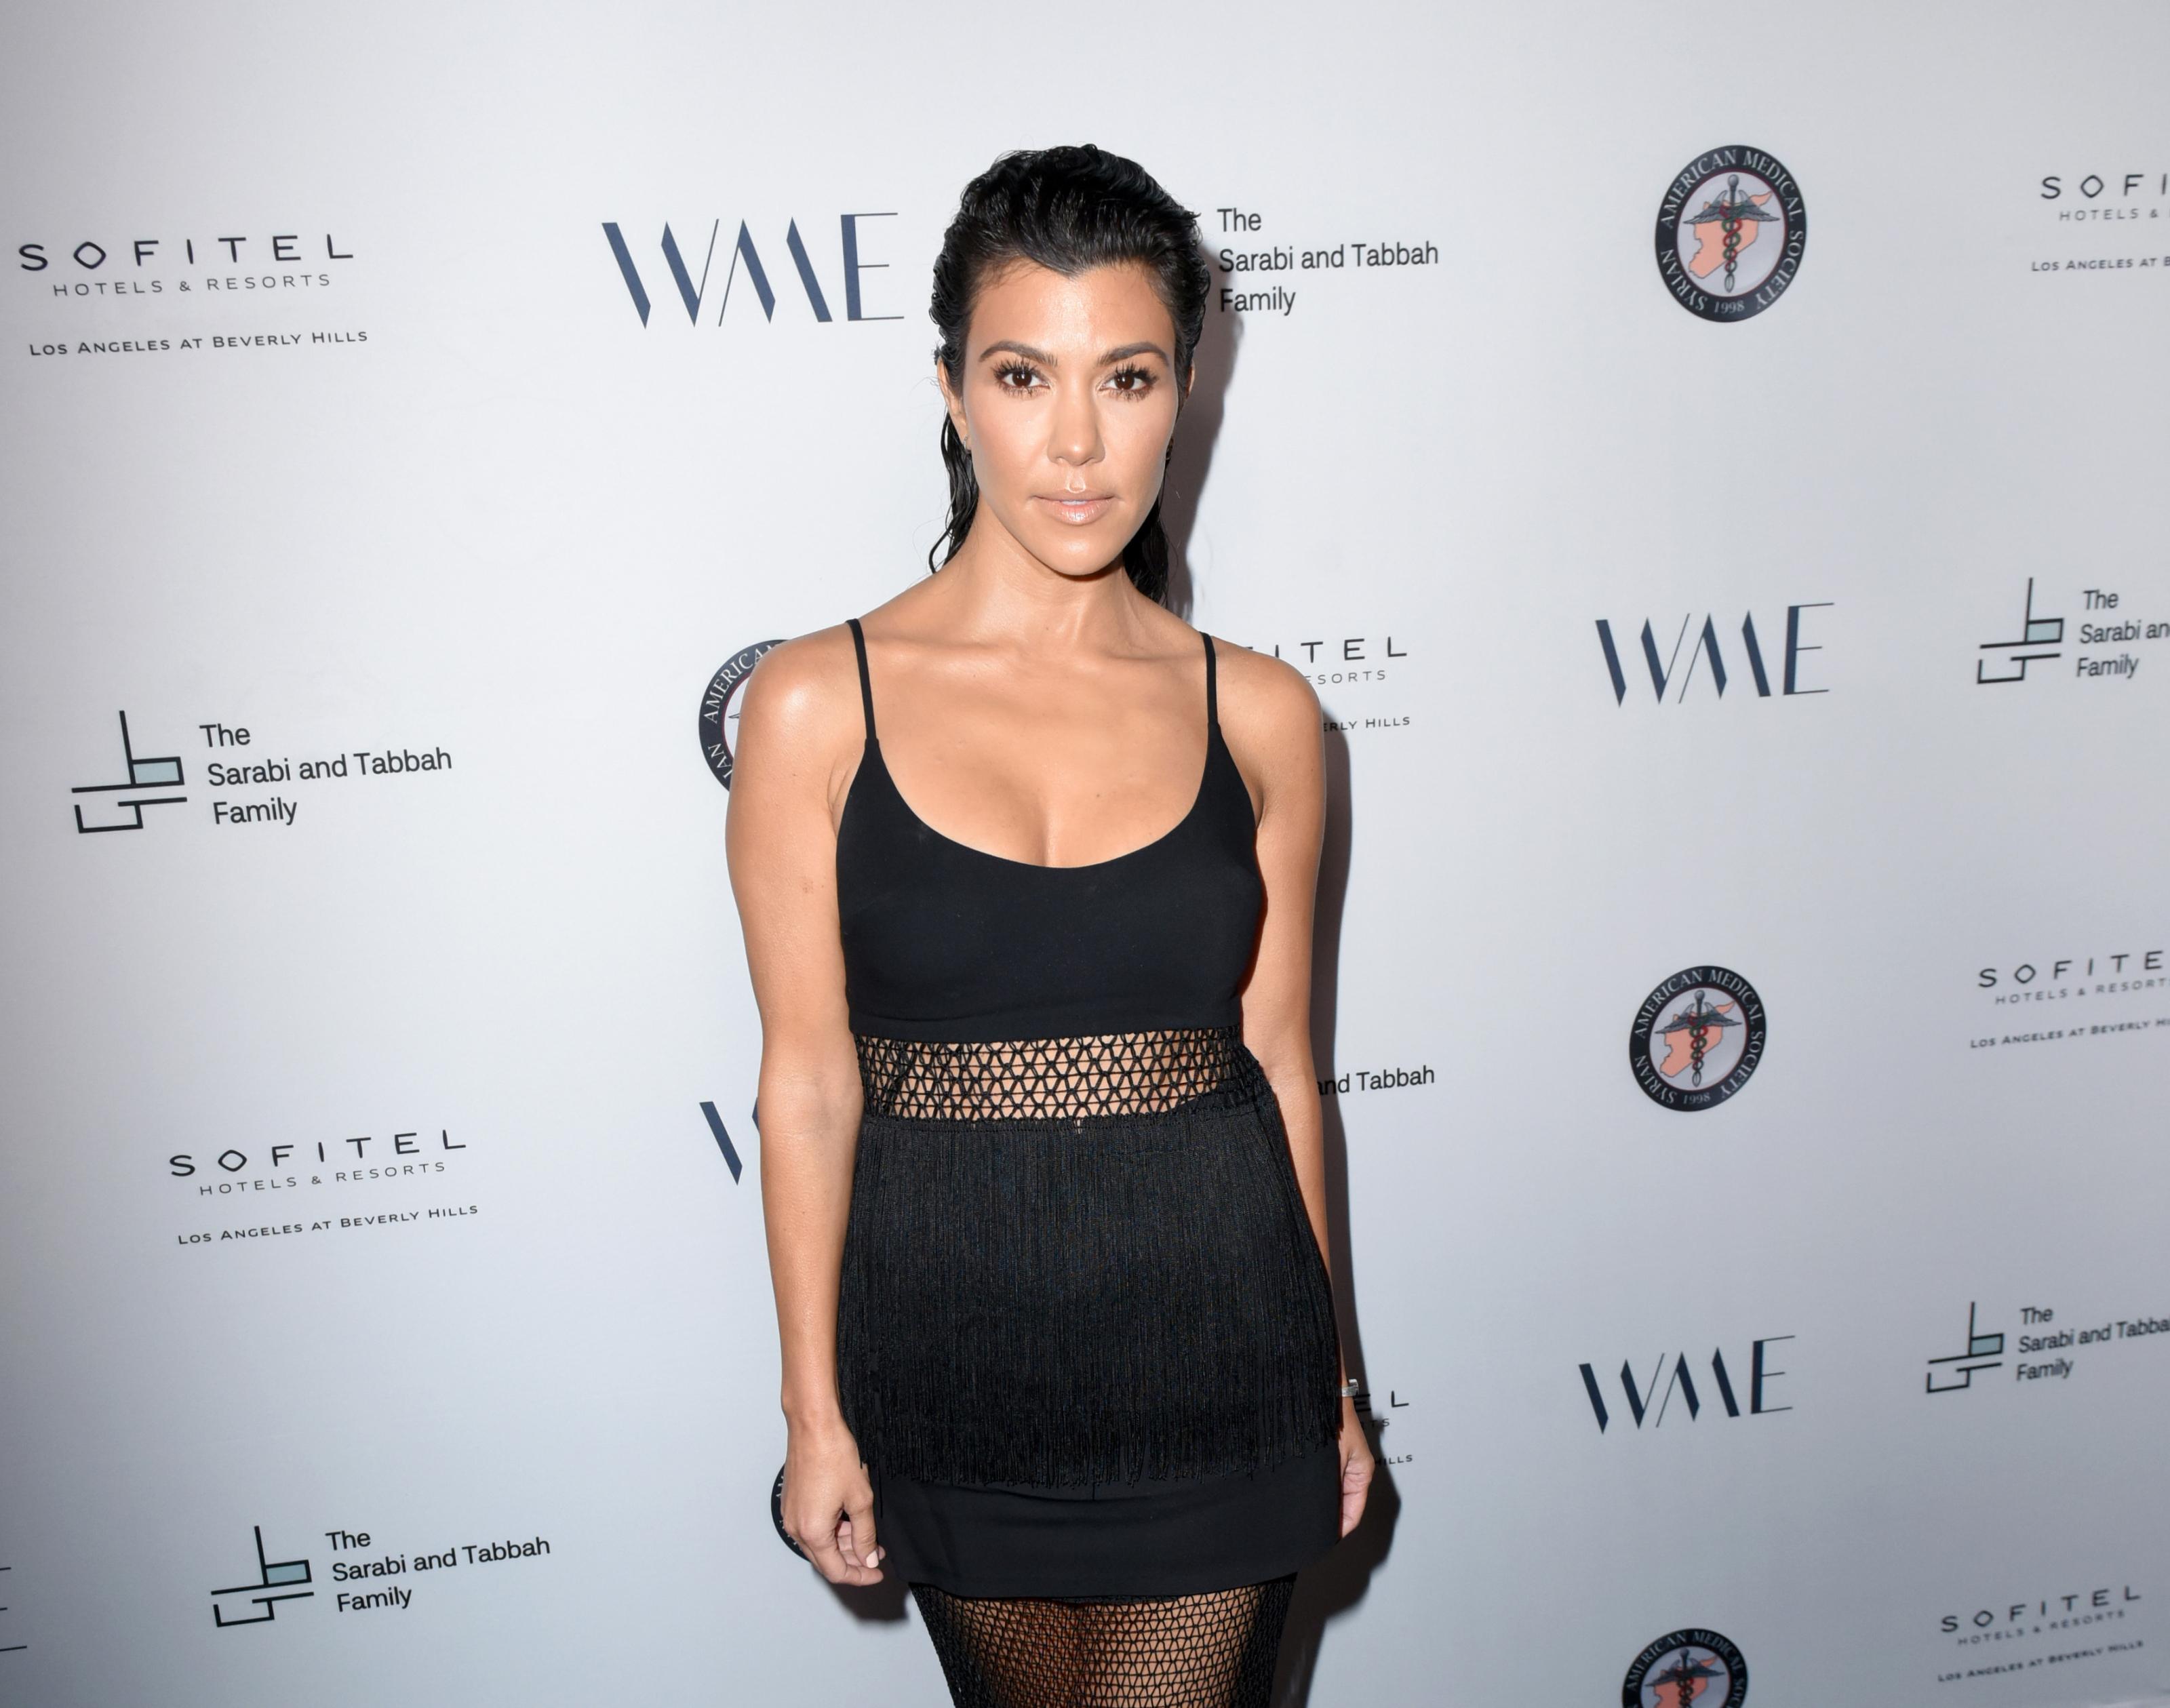 Kourtney Kardashian Shows Off House Gives Glimpse Of Messy Bedroom